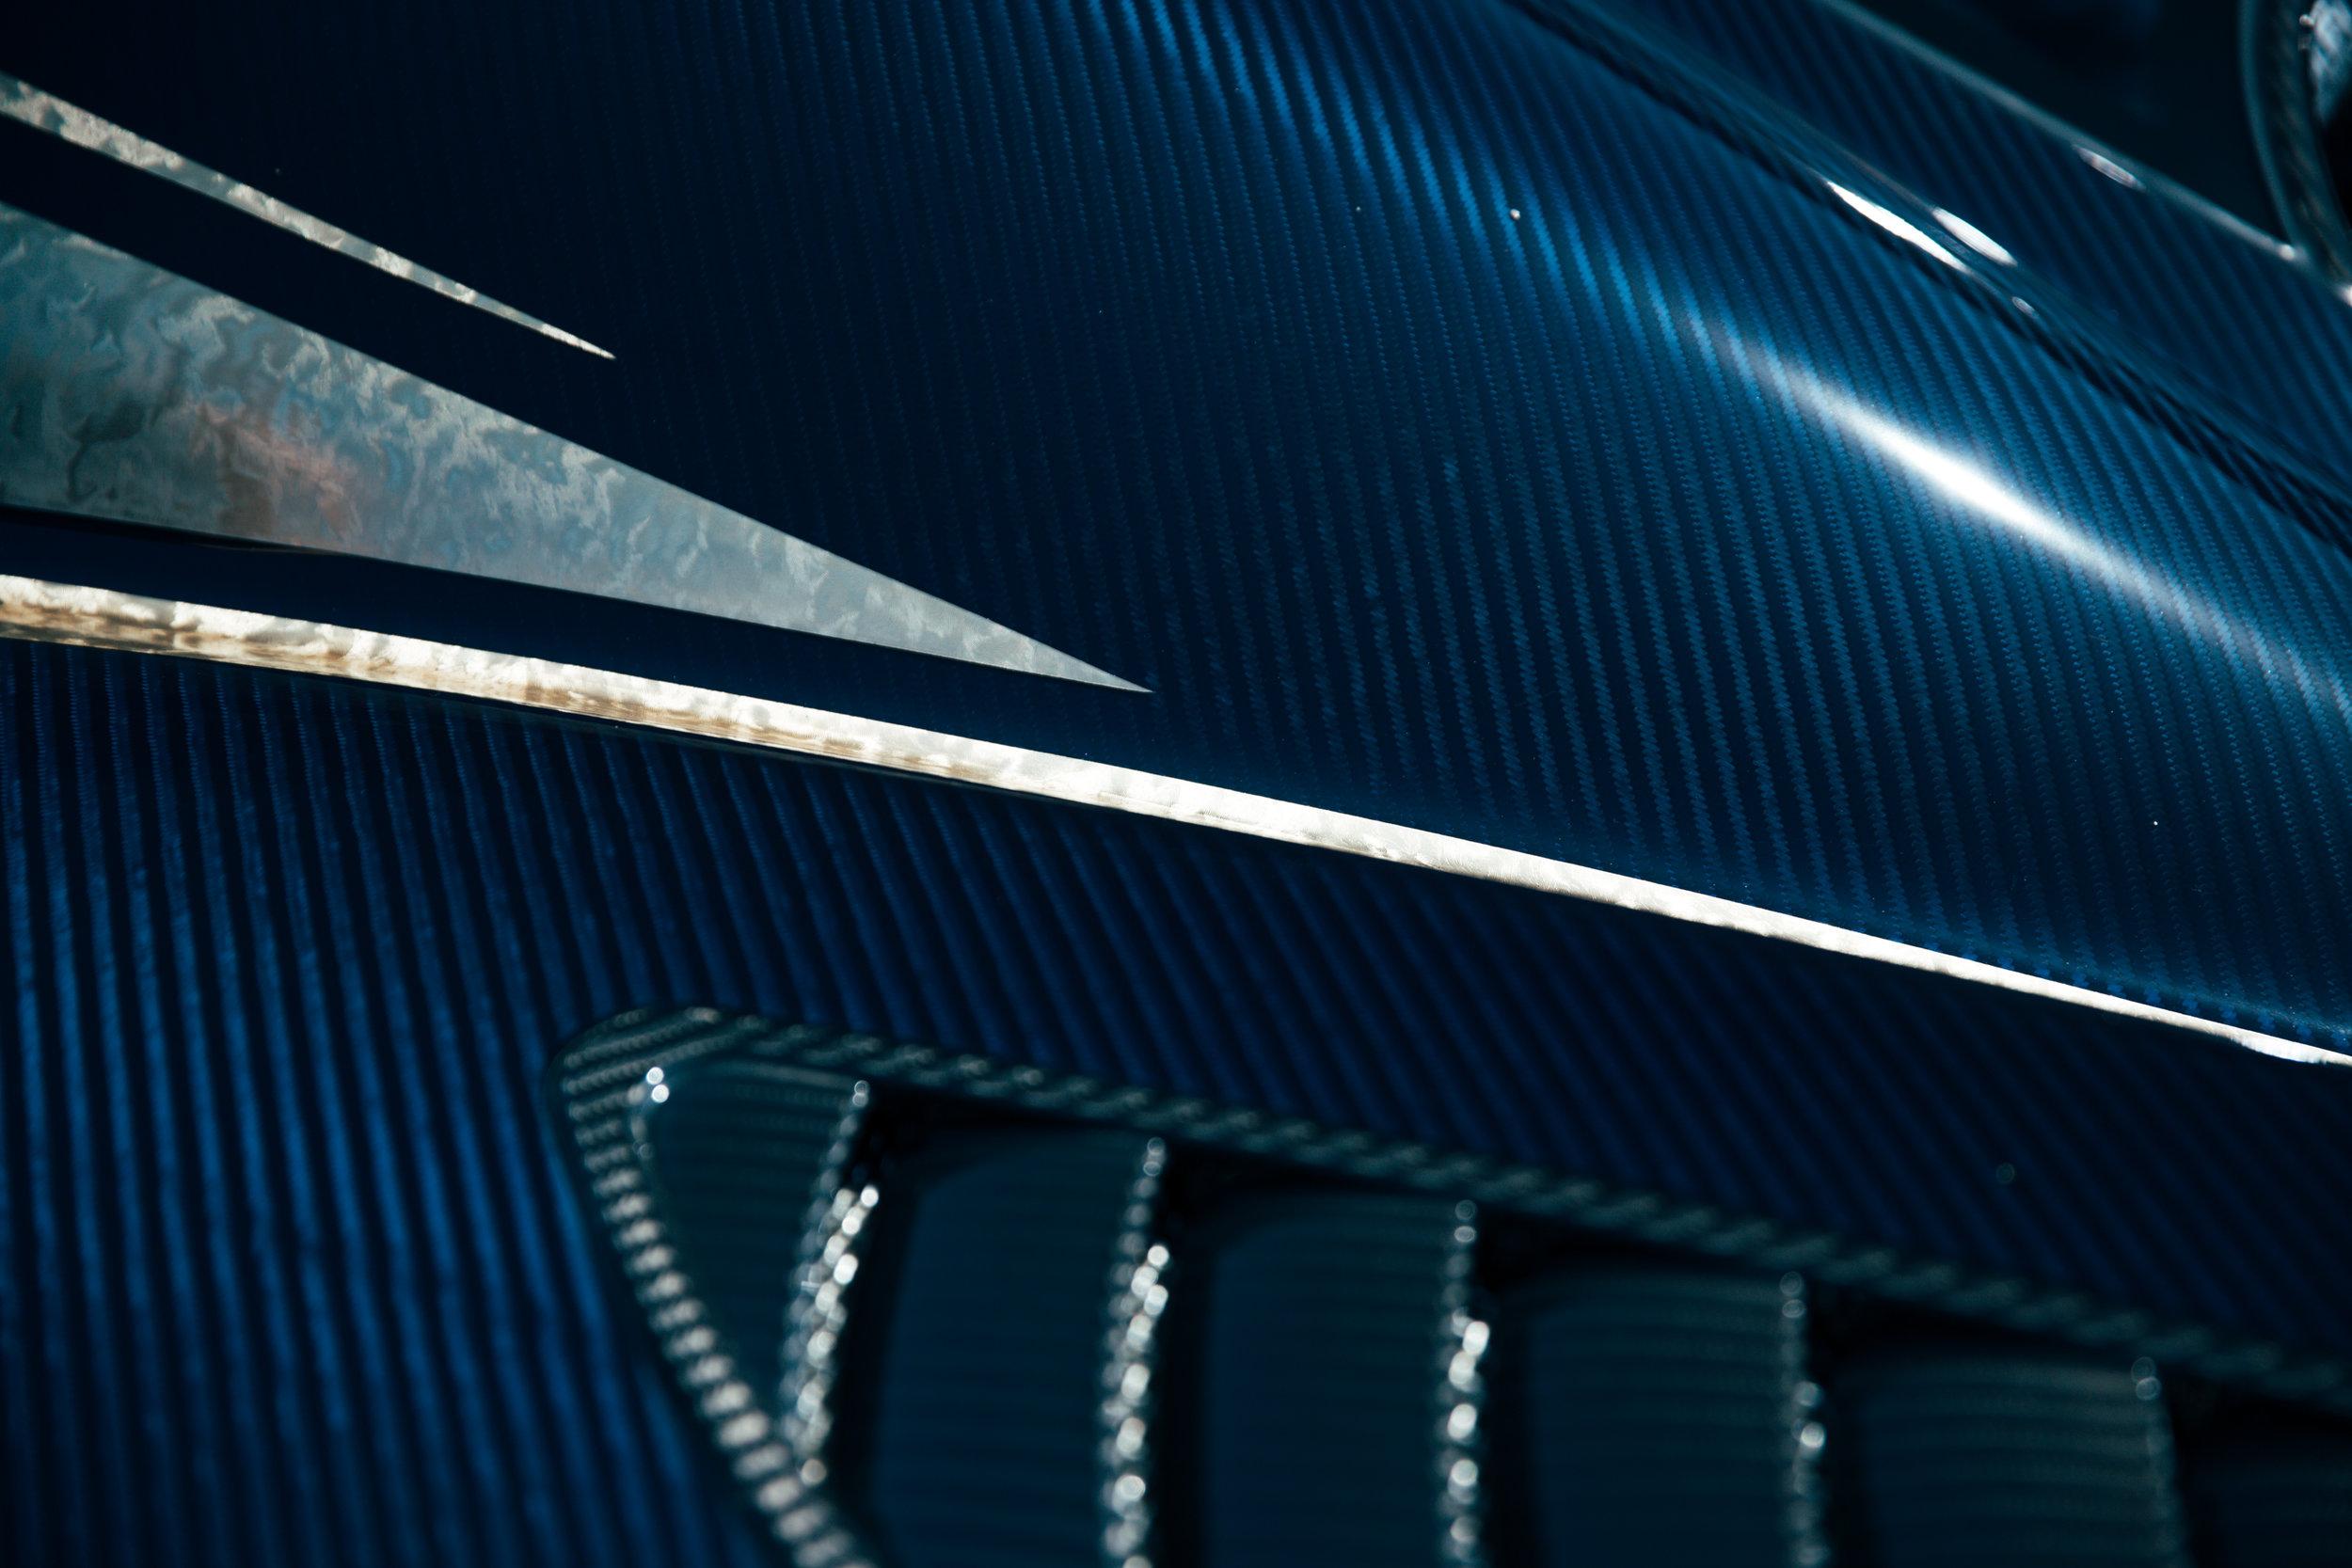 Stay_Driven_Monterey_Car_Week_Koenigsegg-75.jpg